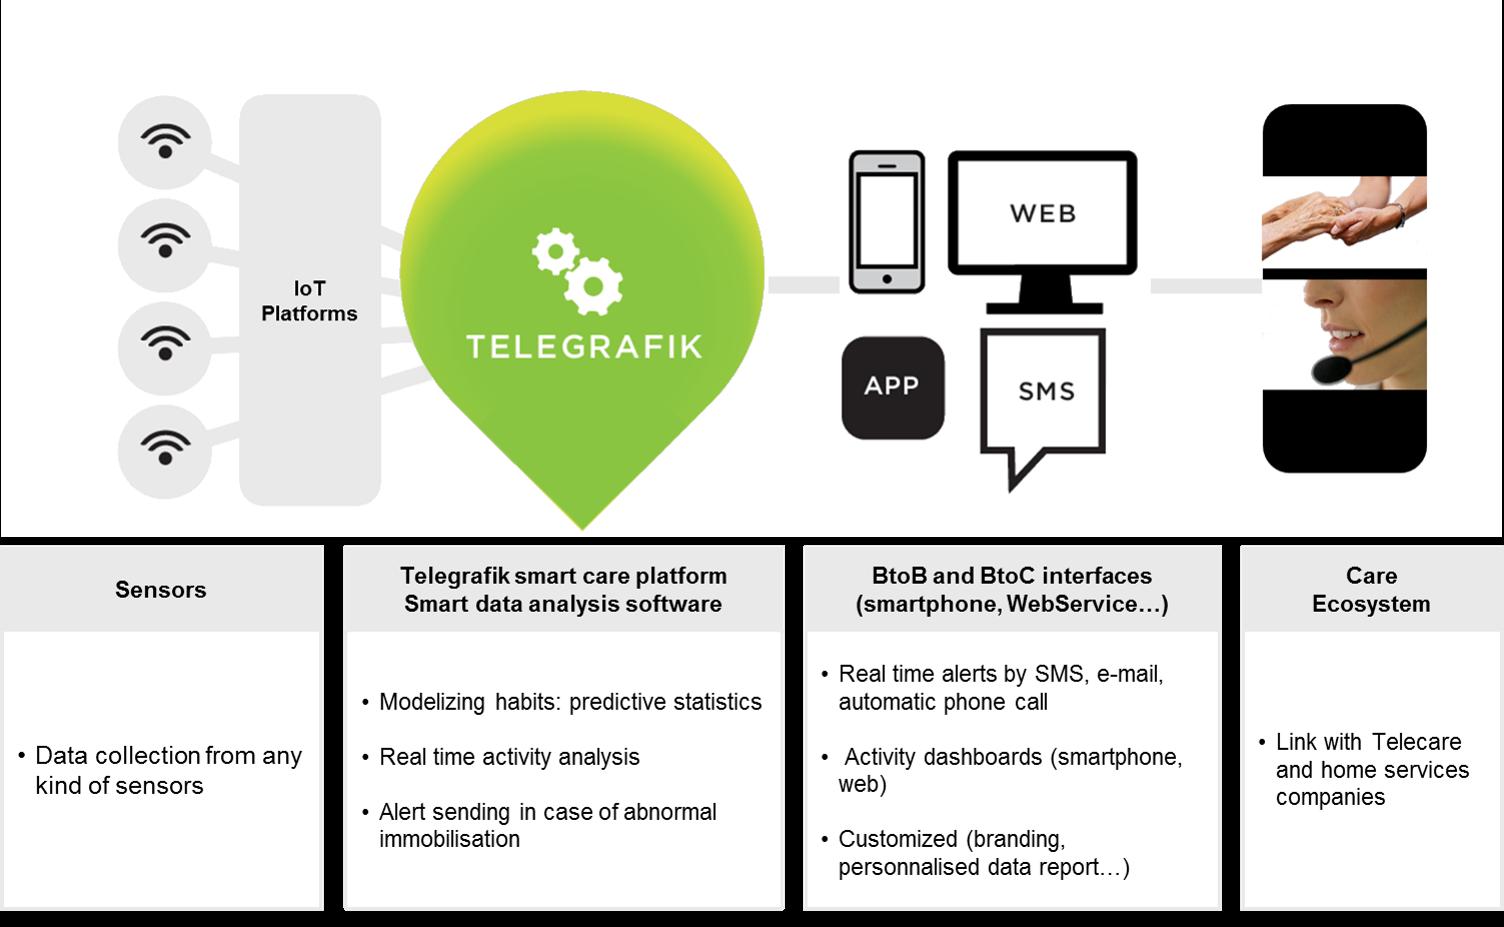 Telegrafik platform design